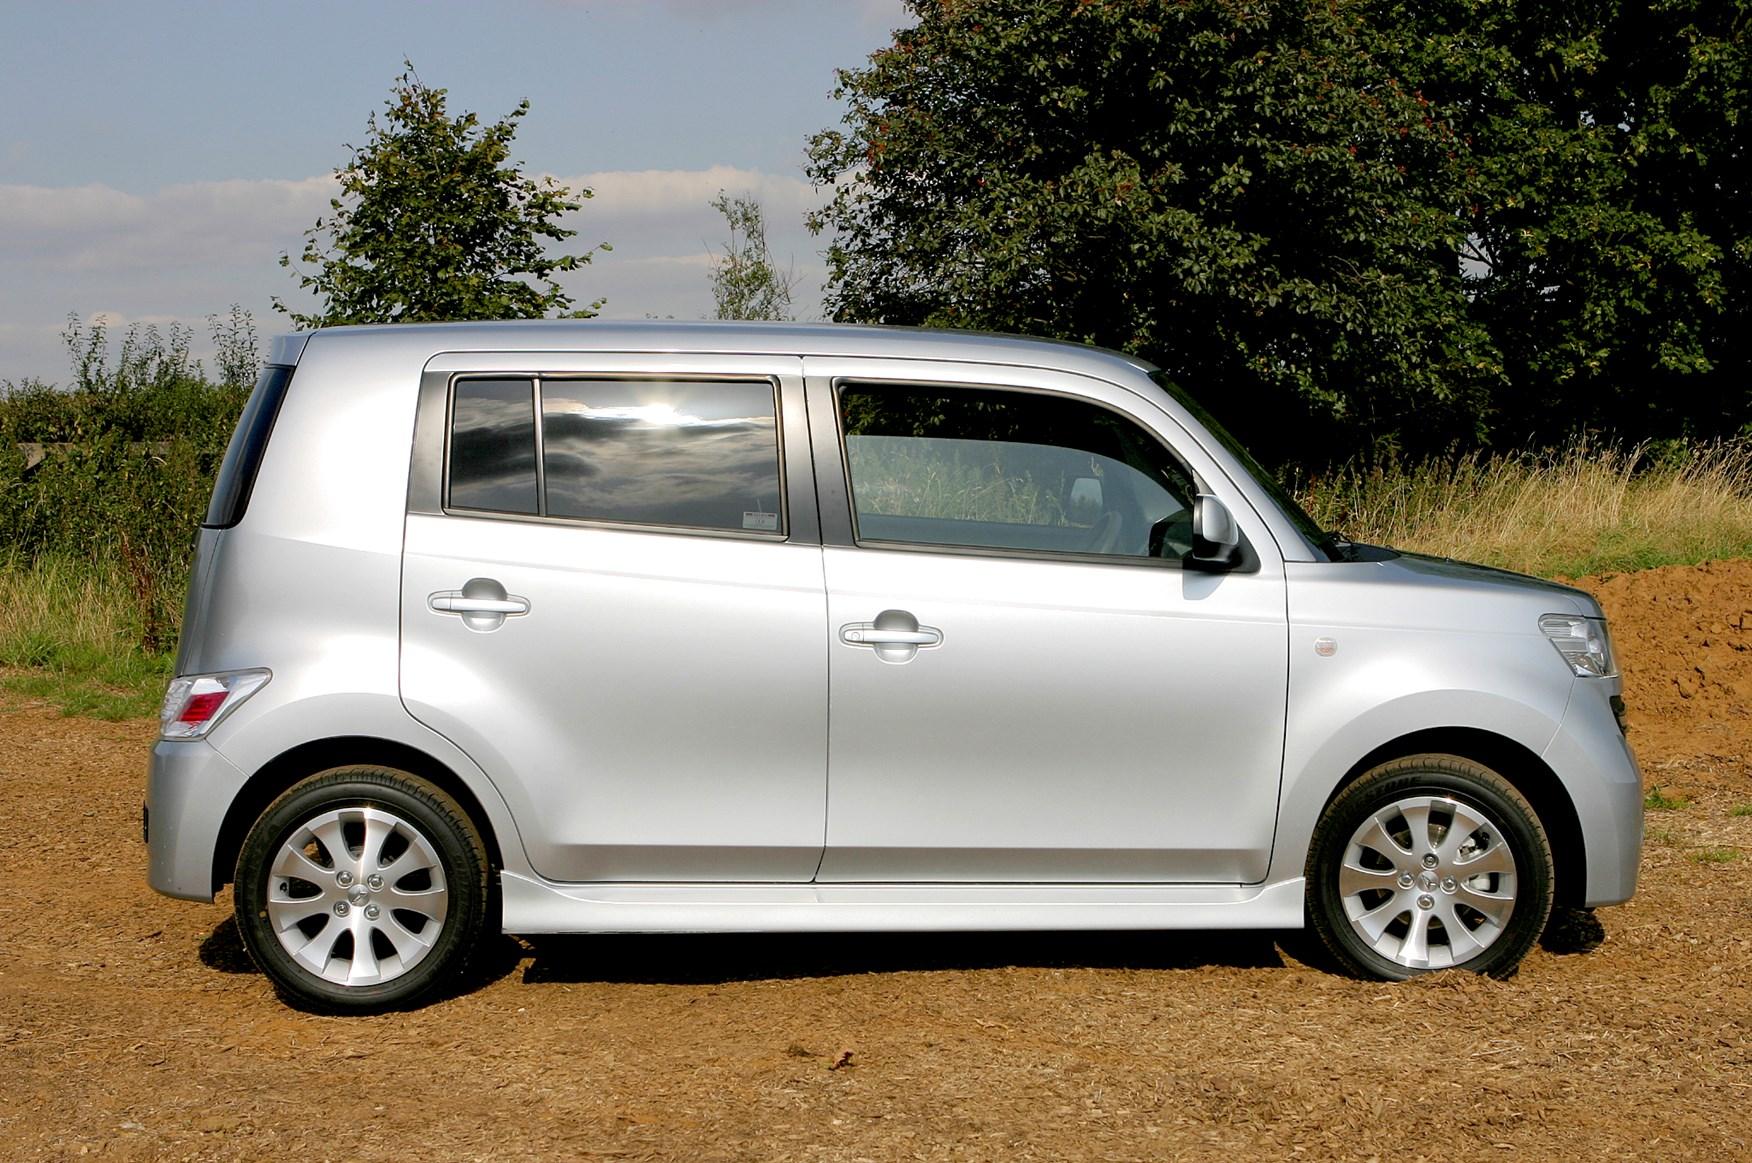 Daihatsu Materia Hatchback Review 2007 2010 Parkers